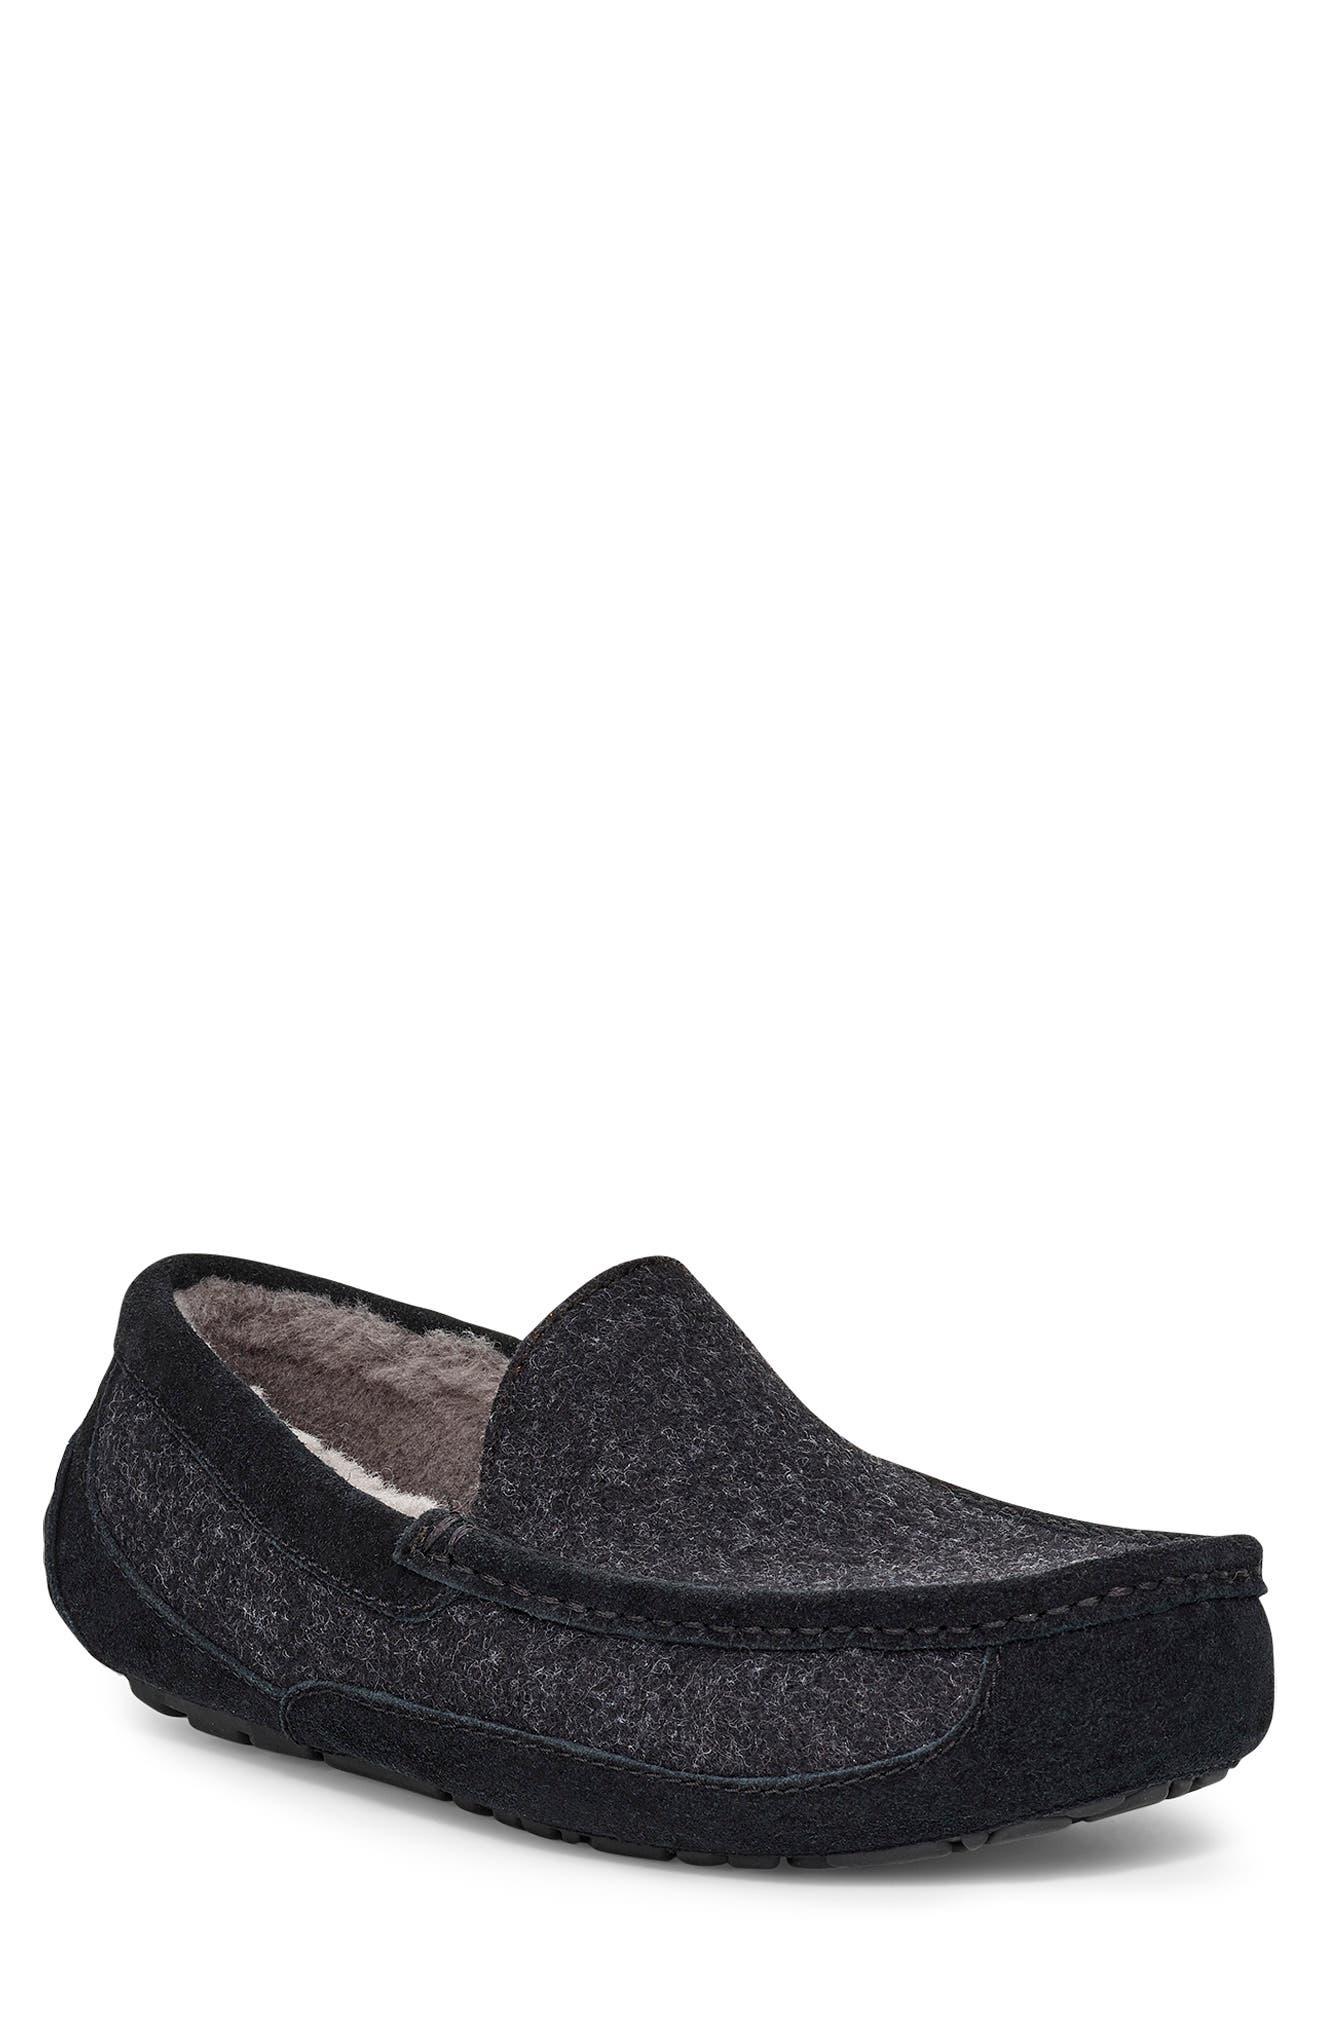 Men's Shoes   Nordstrom Rack